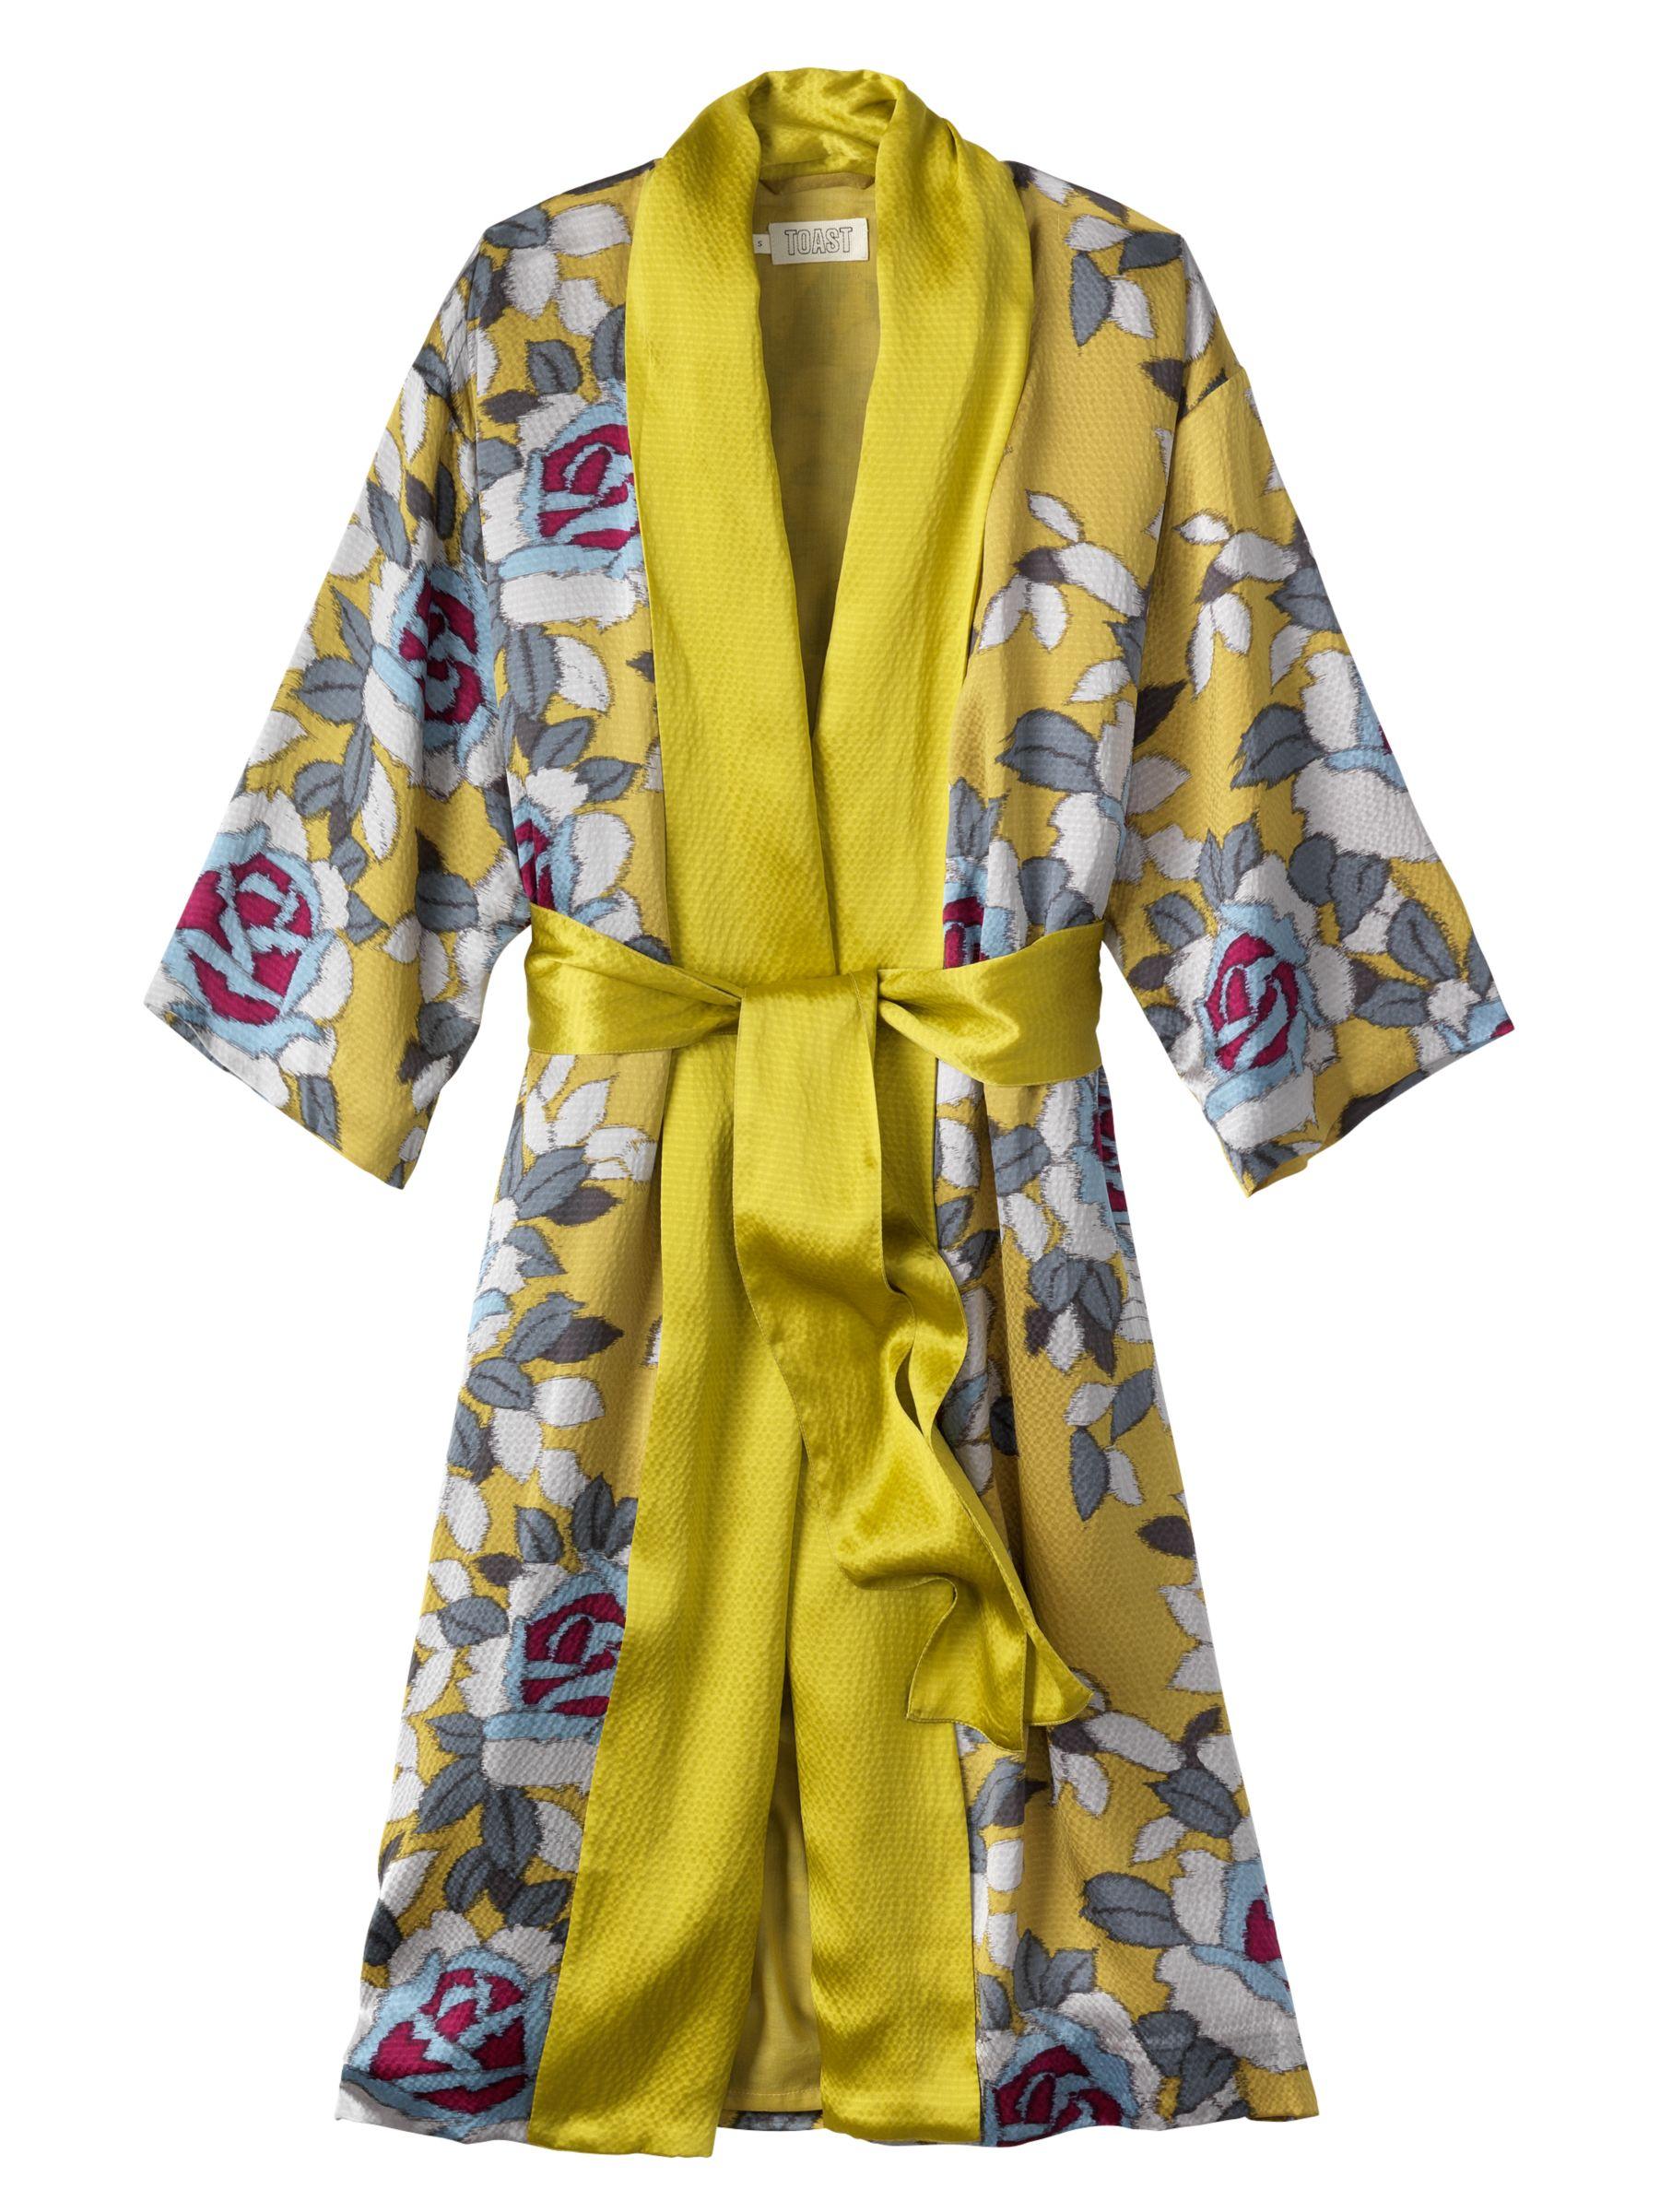 Toast Ottoman Silk Gown, Yellow/Multi at JohnLewis